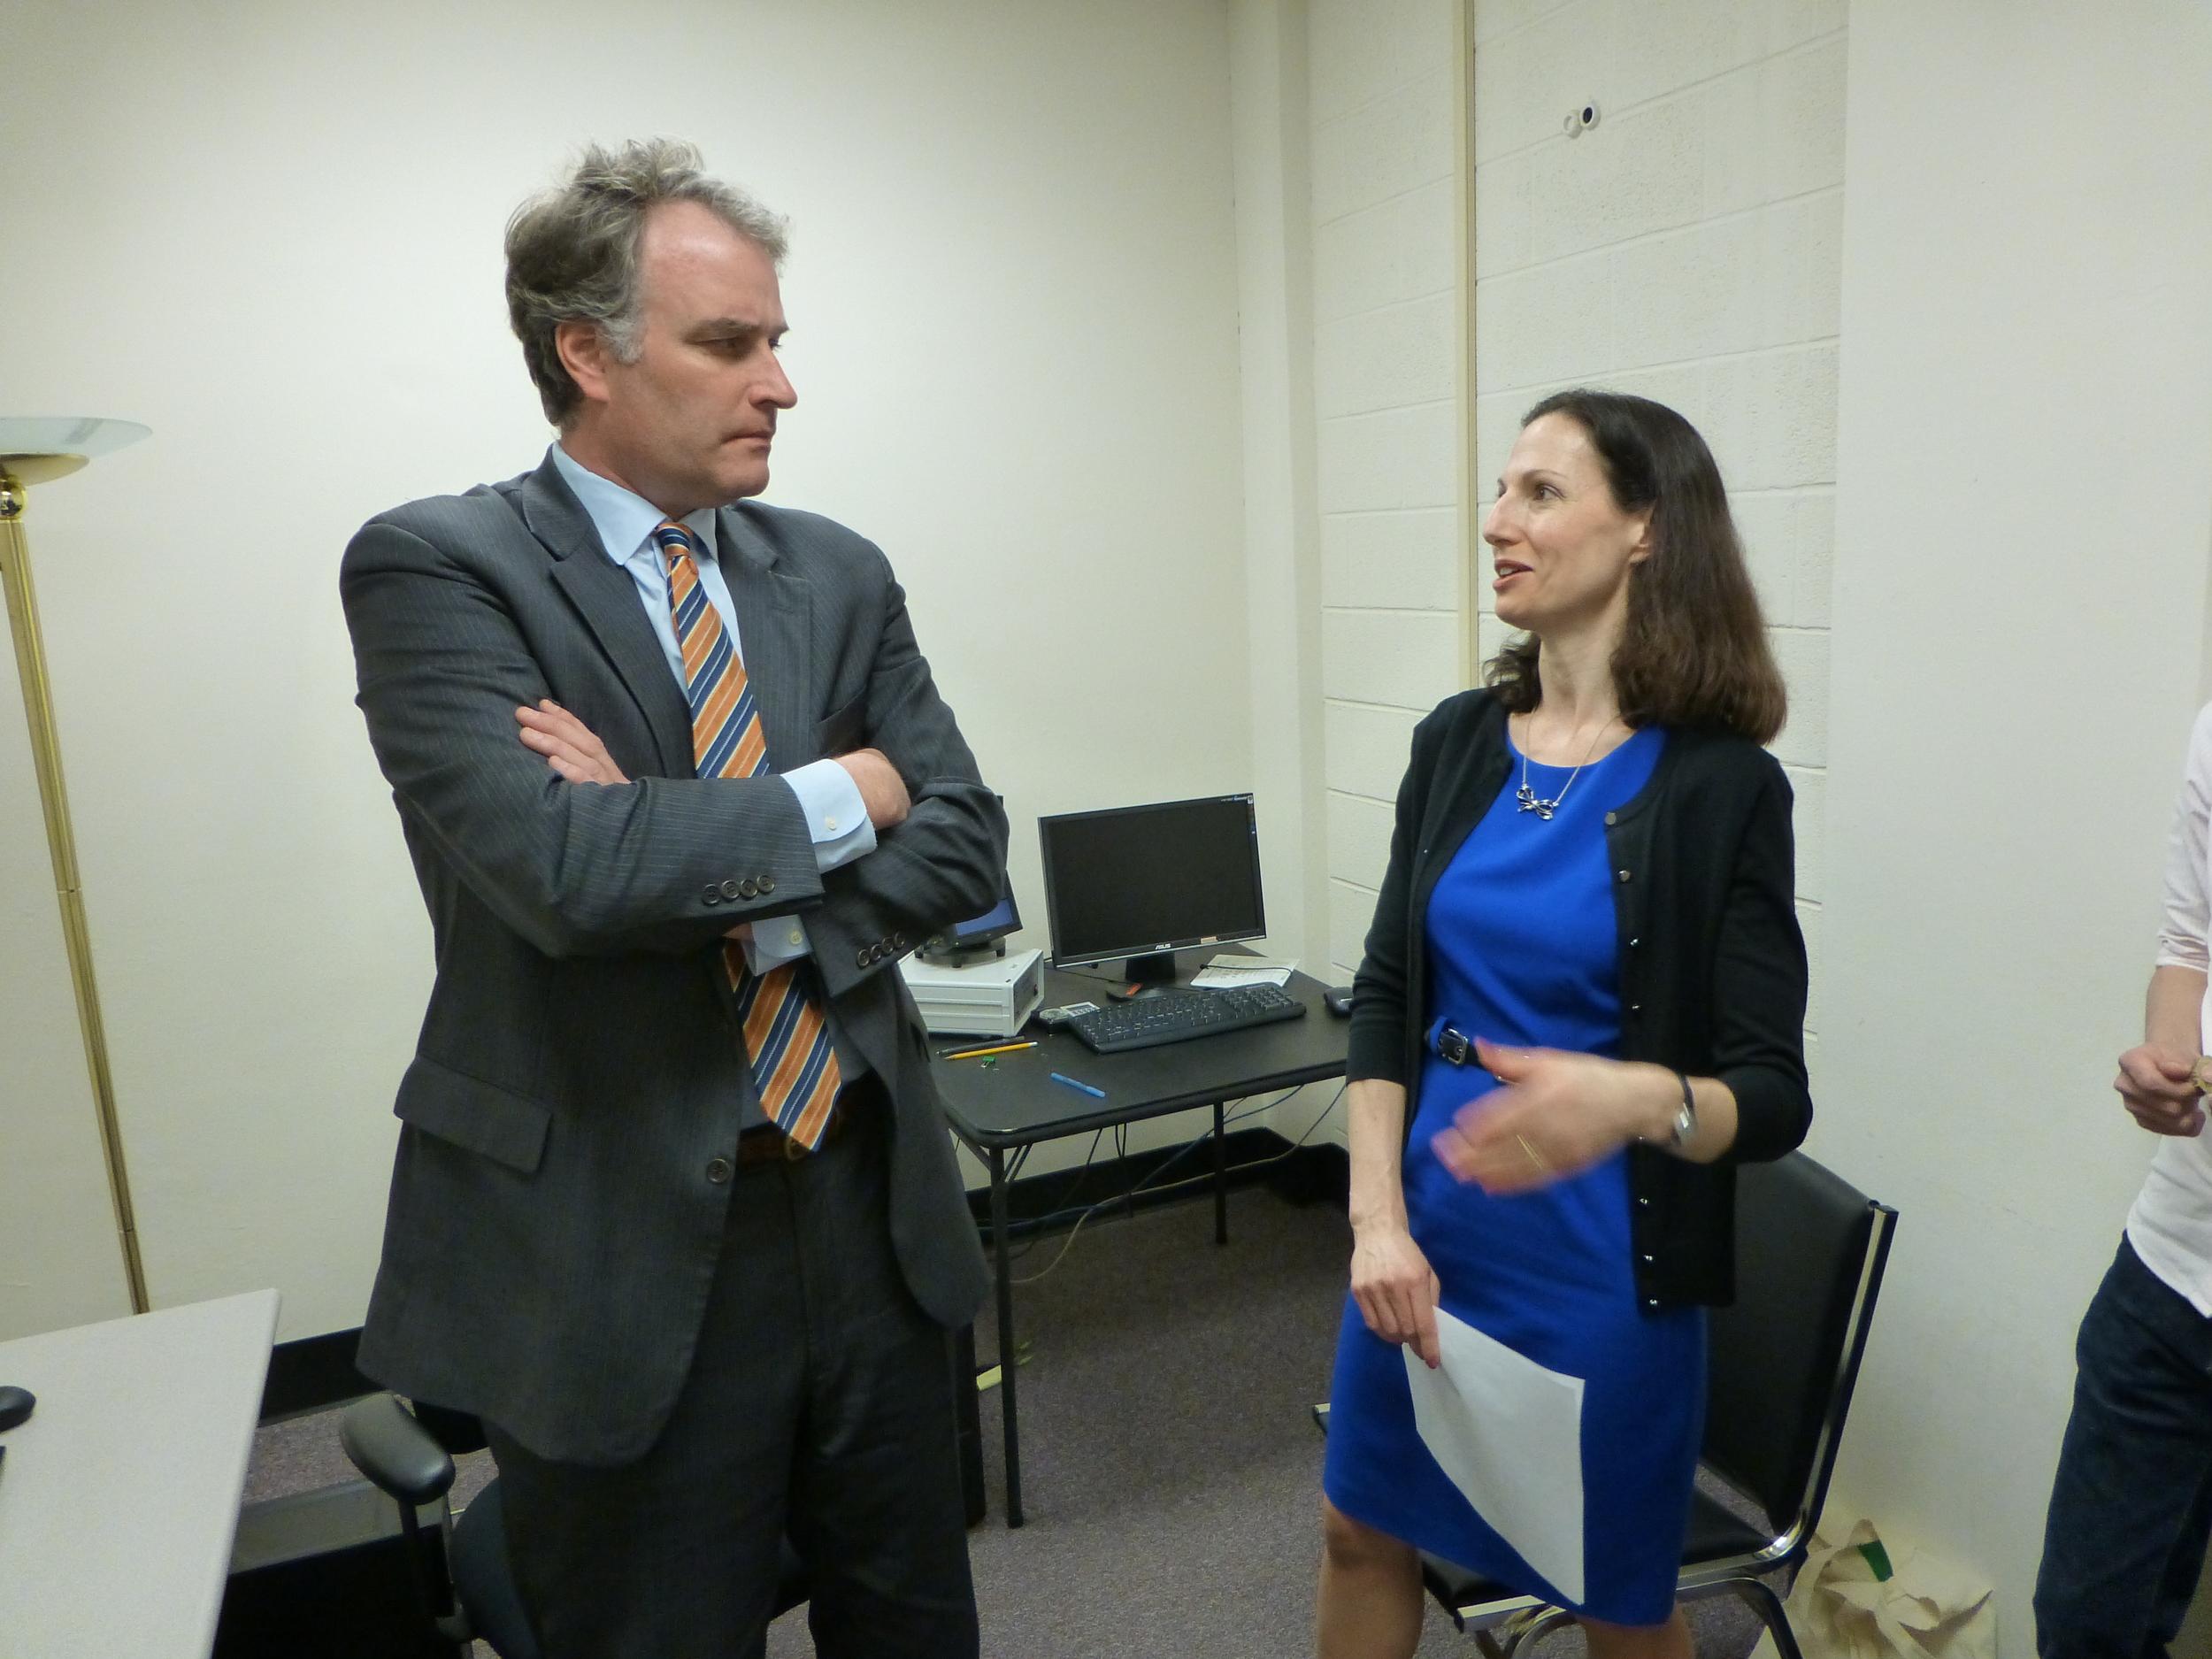 Rep. Robert Hurt (R-VA) and Dr. Bethany Teachman